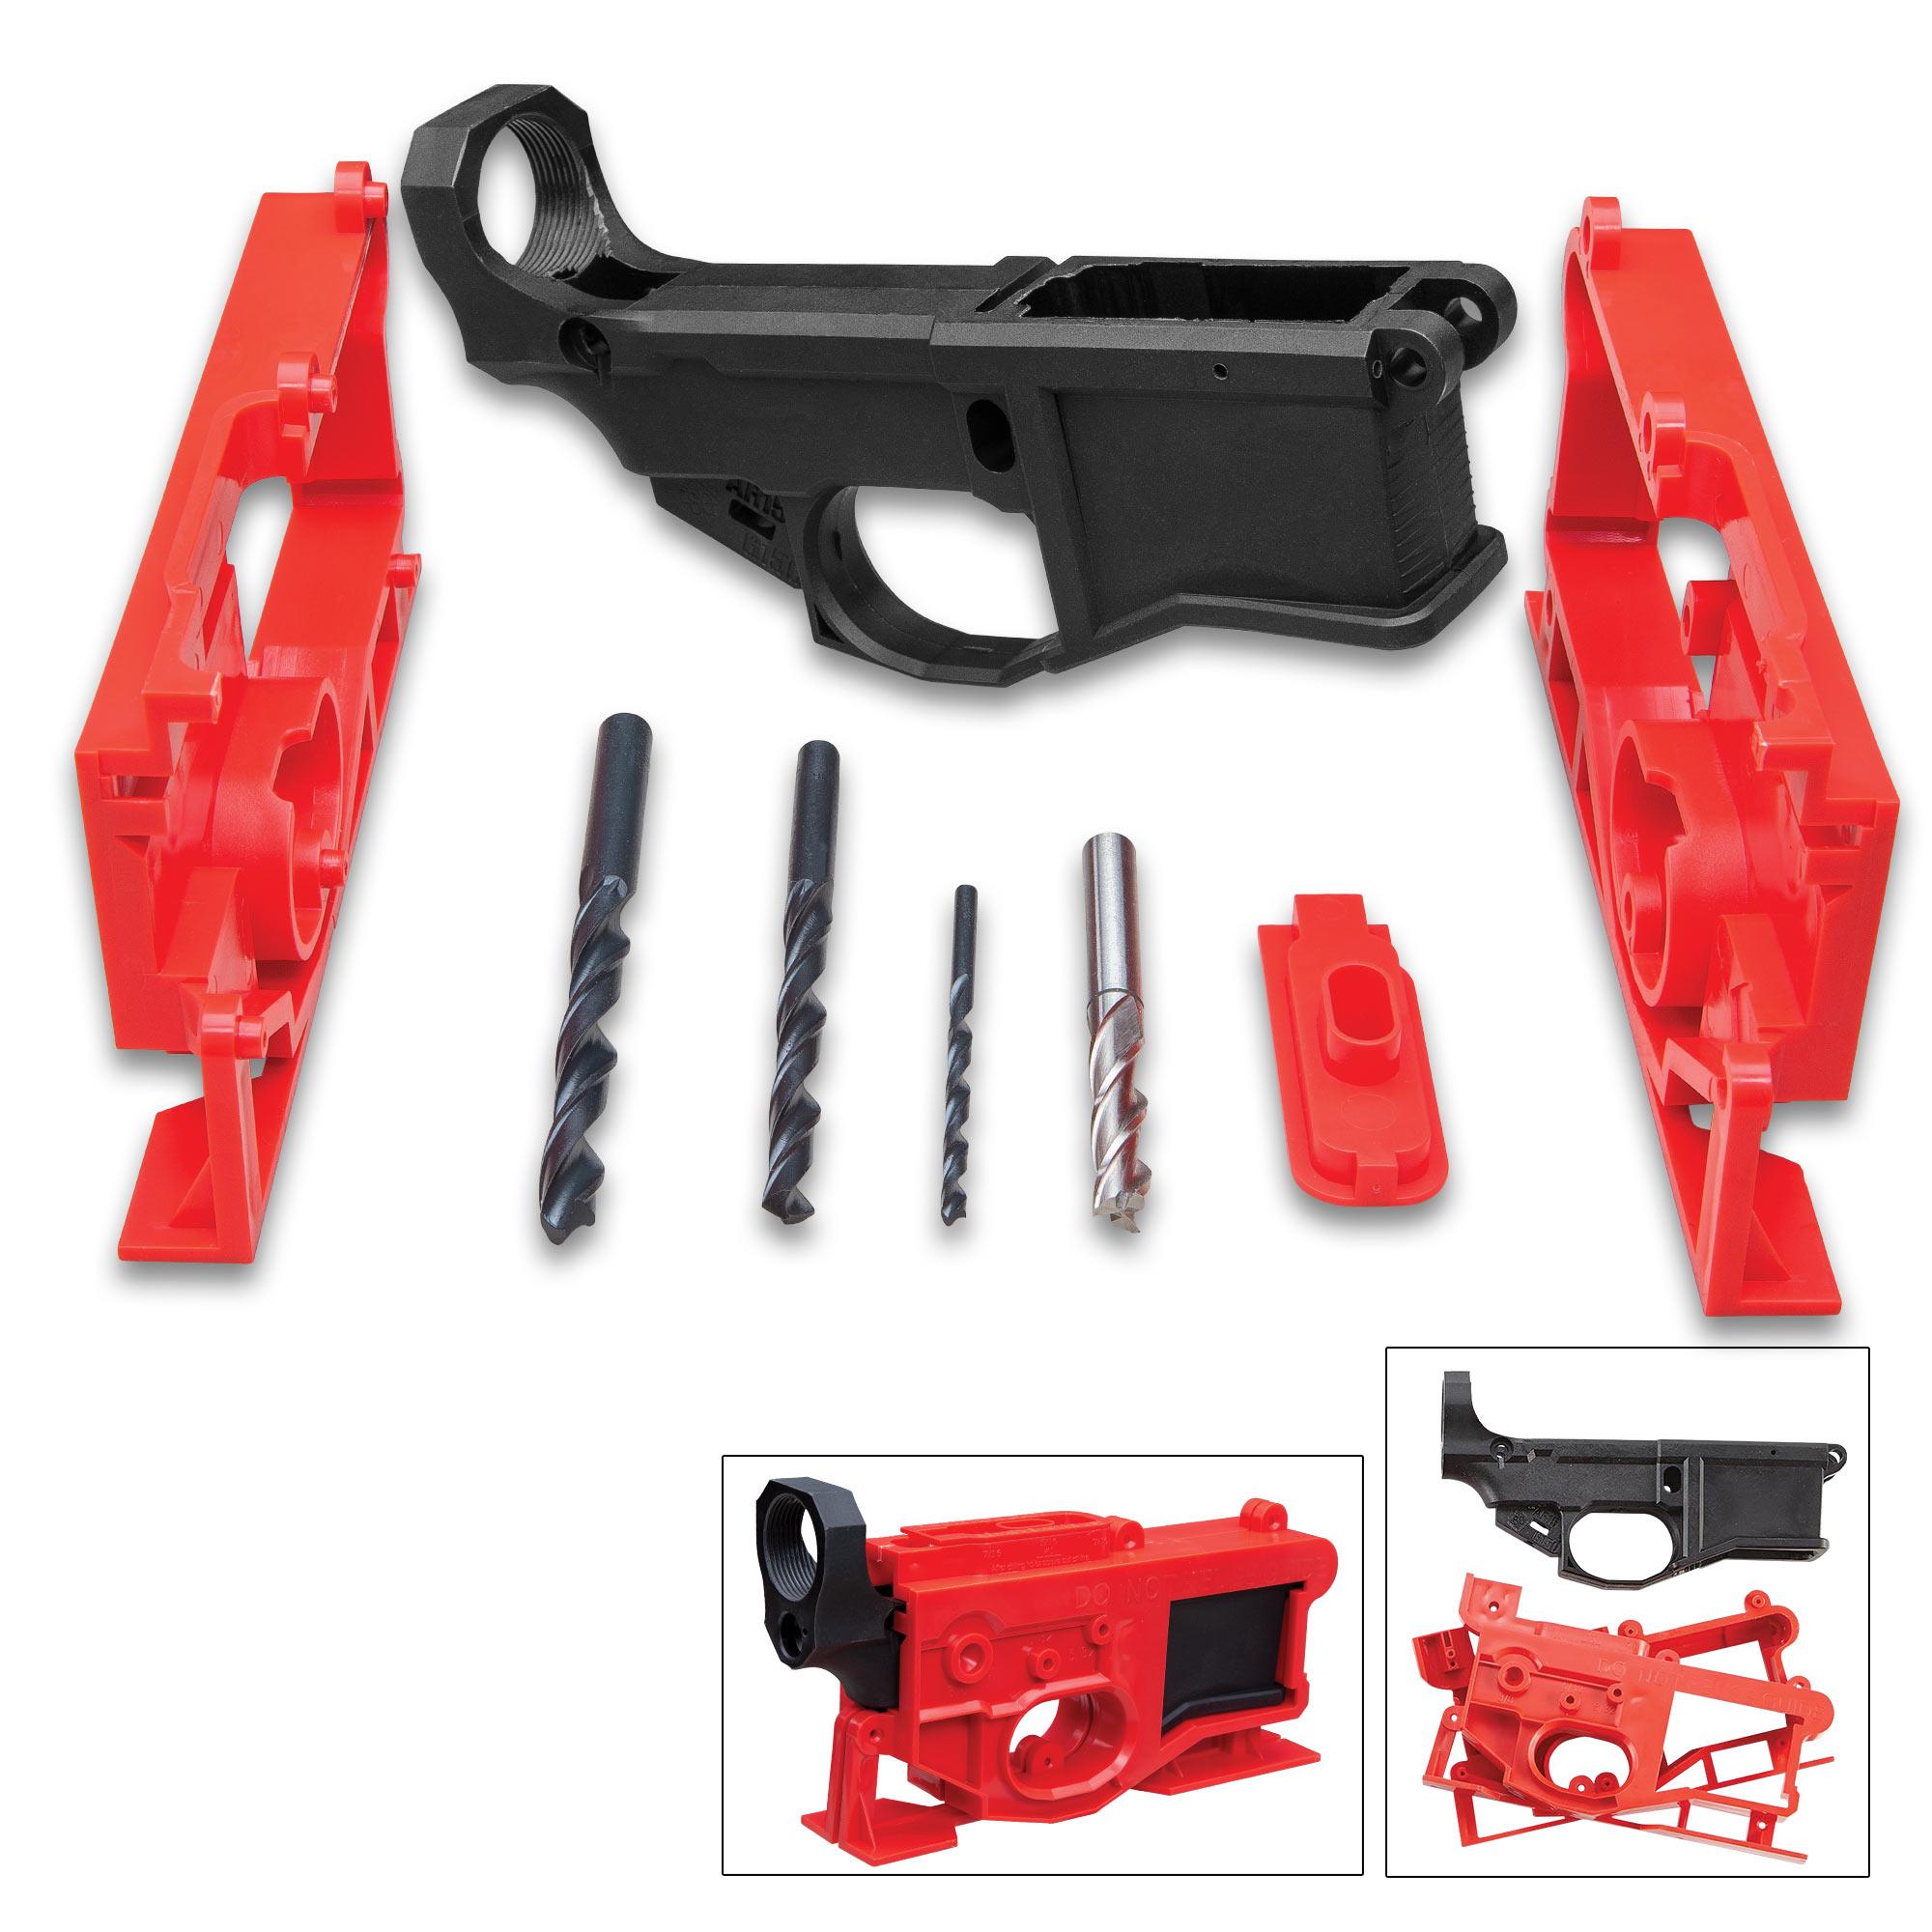 Ar15 80 lower receiver and jig kit polymer80 chkadels com